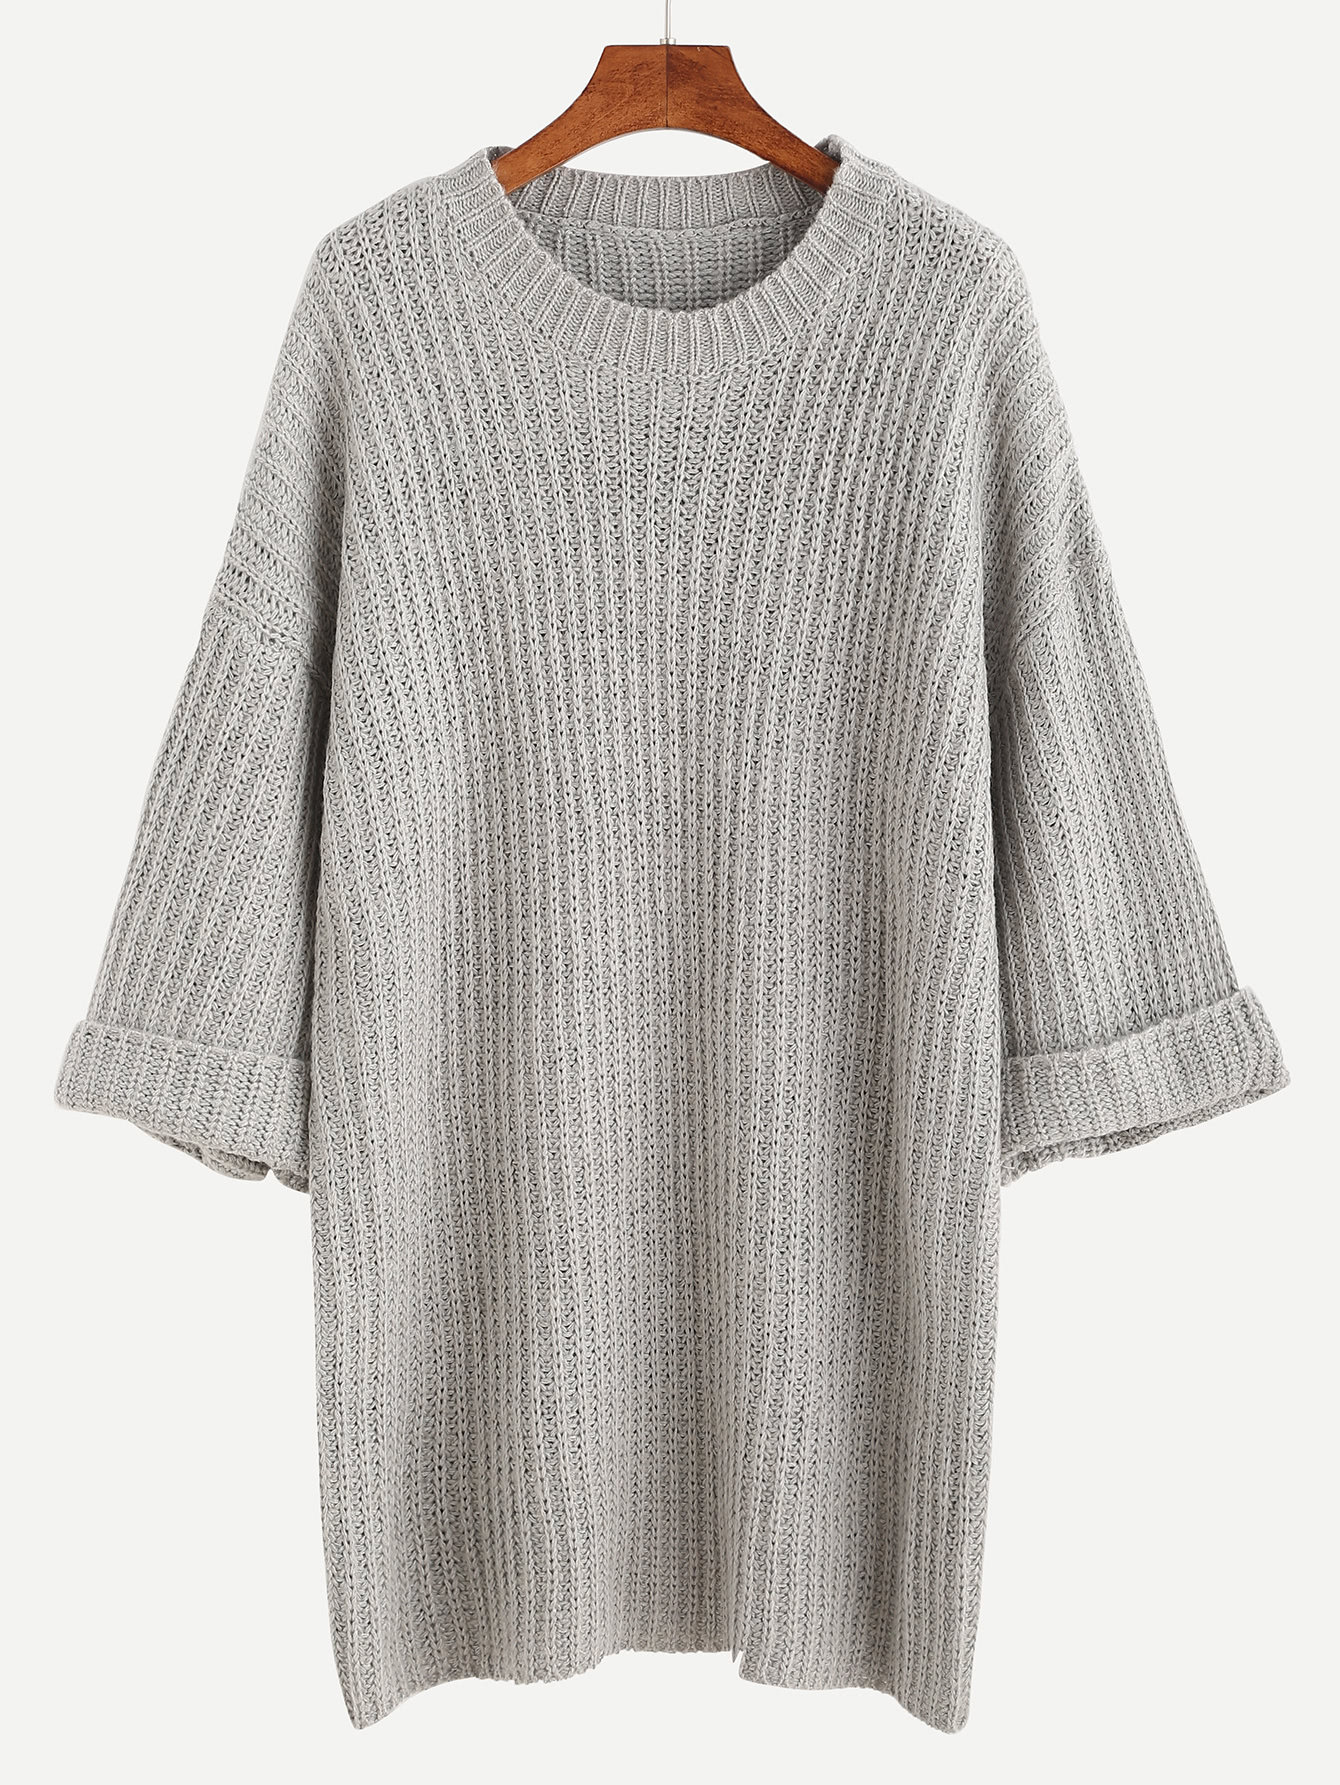 Grey Dropped Shoulder Seam Cuffed Sweater Dress RDRE160922102